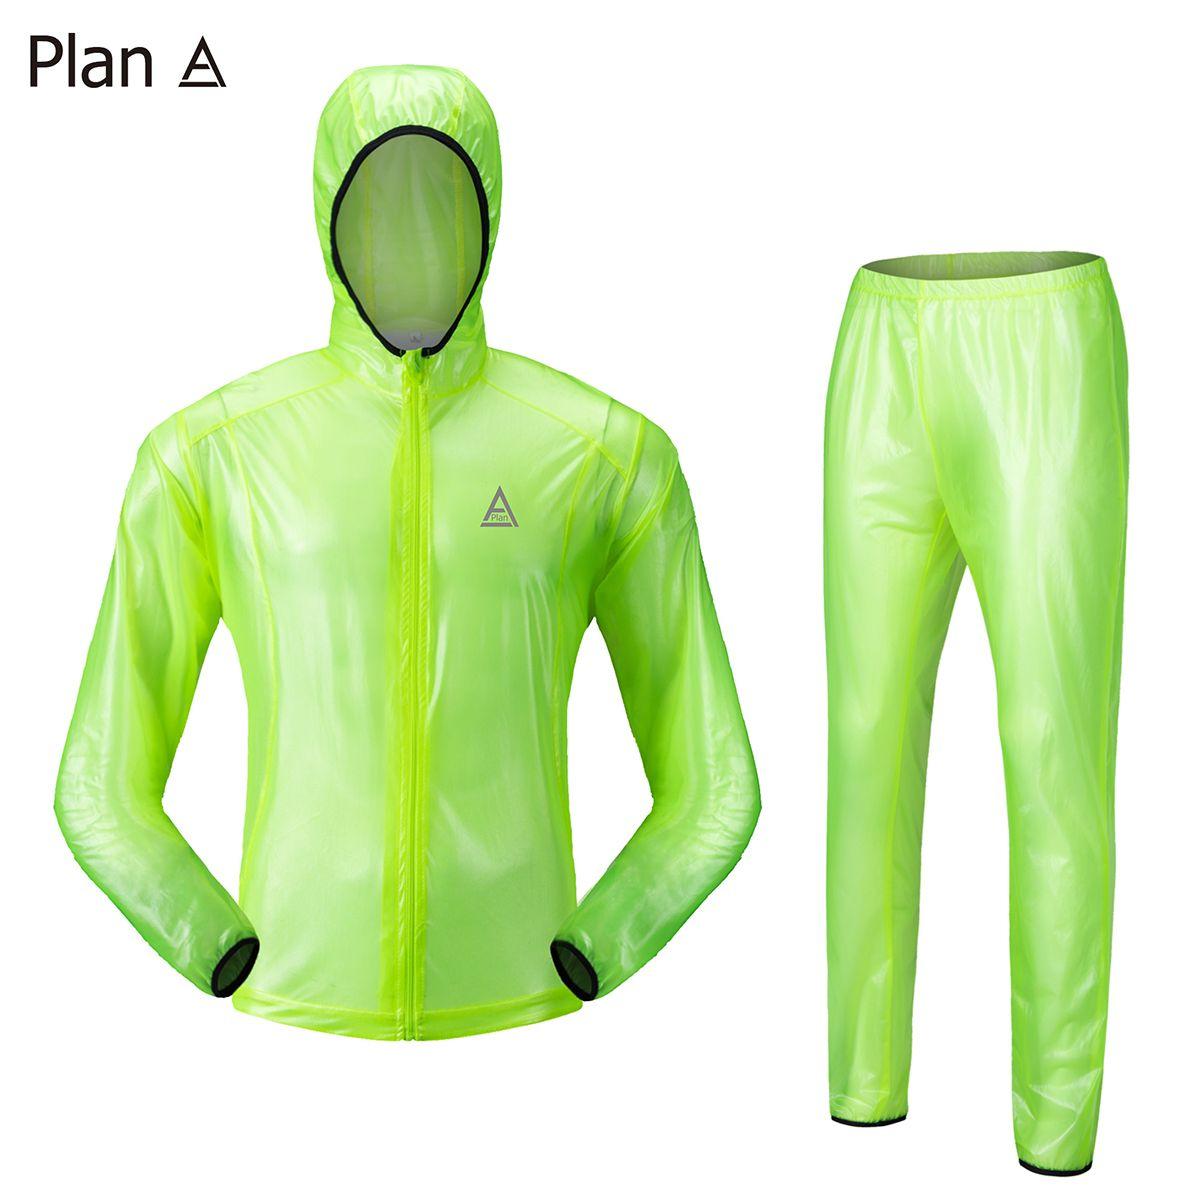 2017 Team Cycling jersey Men Long Sleeve Windproof Anti-UV Breathable Waterproof Bicycle RainCoat Bike Clothing